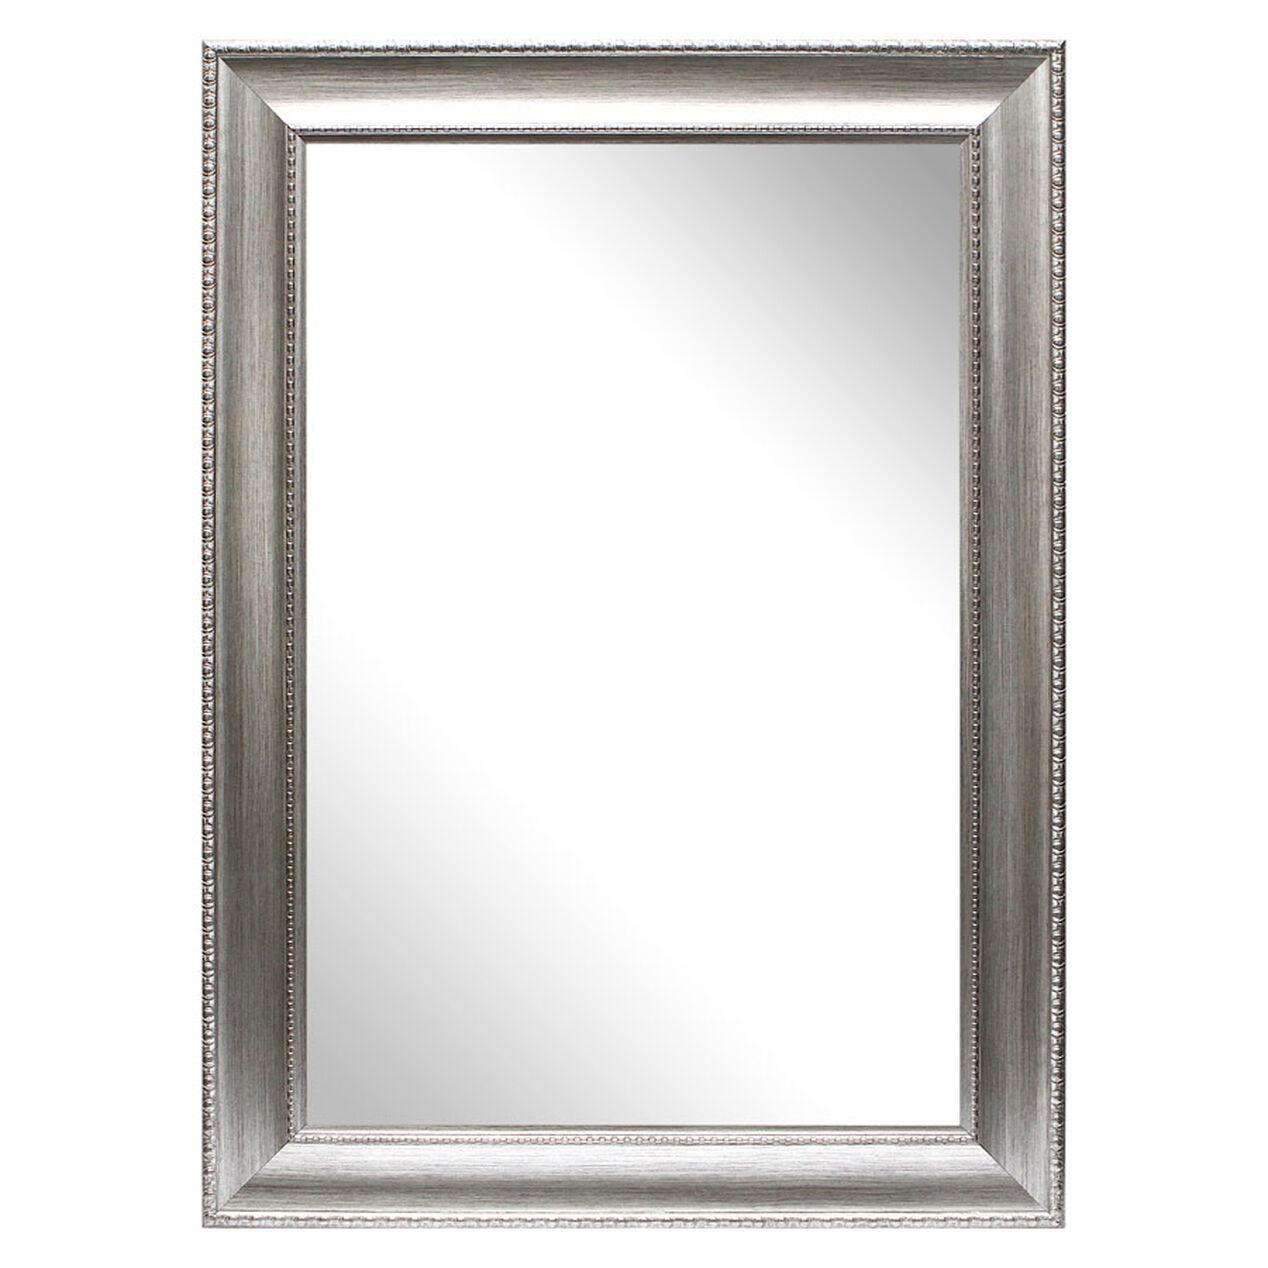 124147780 Bathroom Mirrors Frames